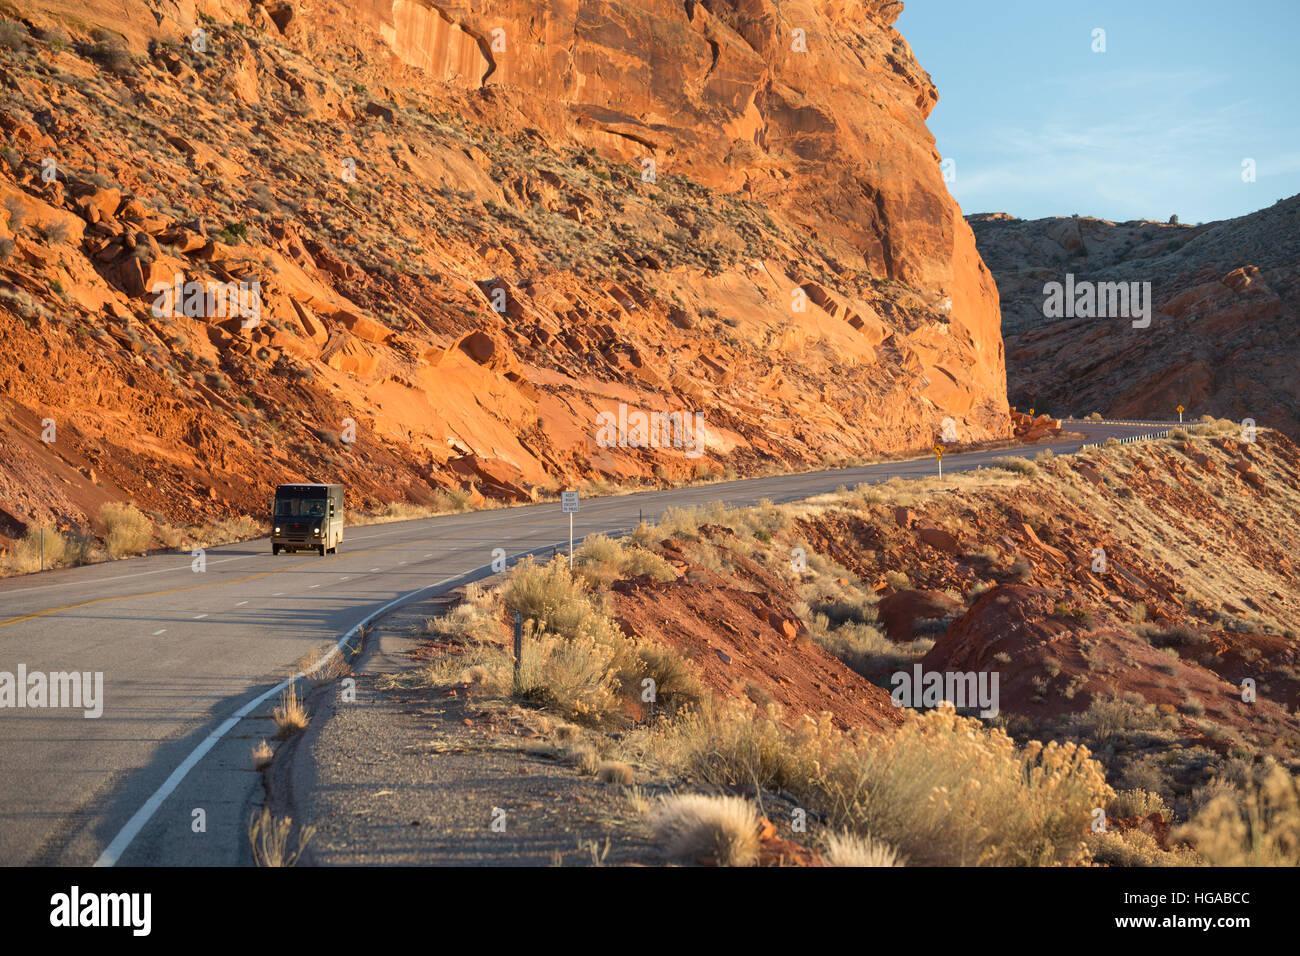 Bluff, Utah - A UPS Lieferwagen auf uns Highway 163, Kreuzung Comb Ridge im Bären Ohren National Monument. Stockbild